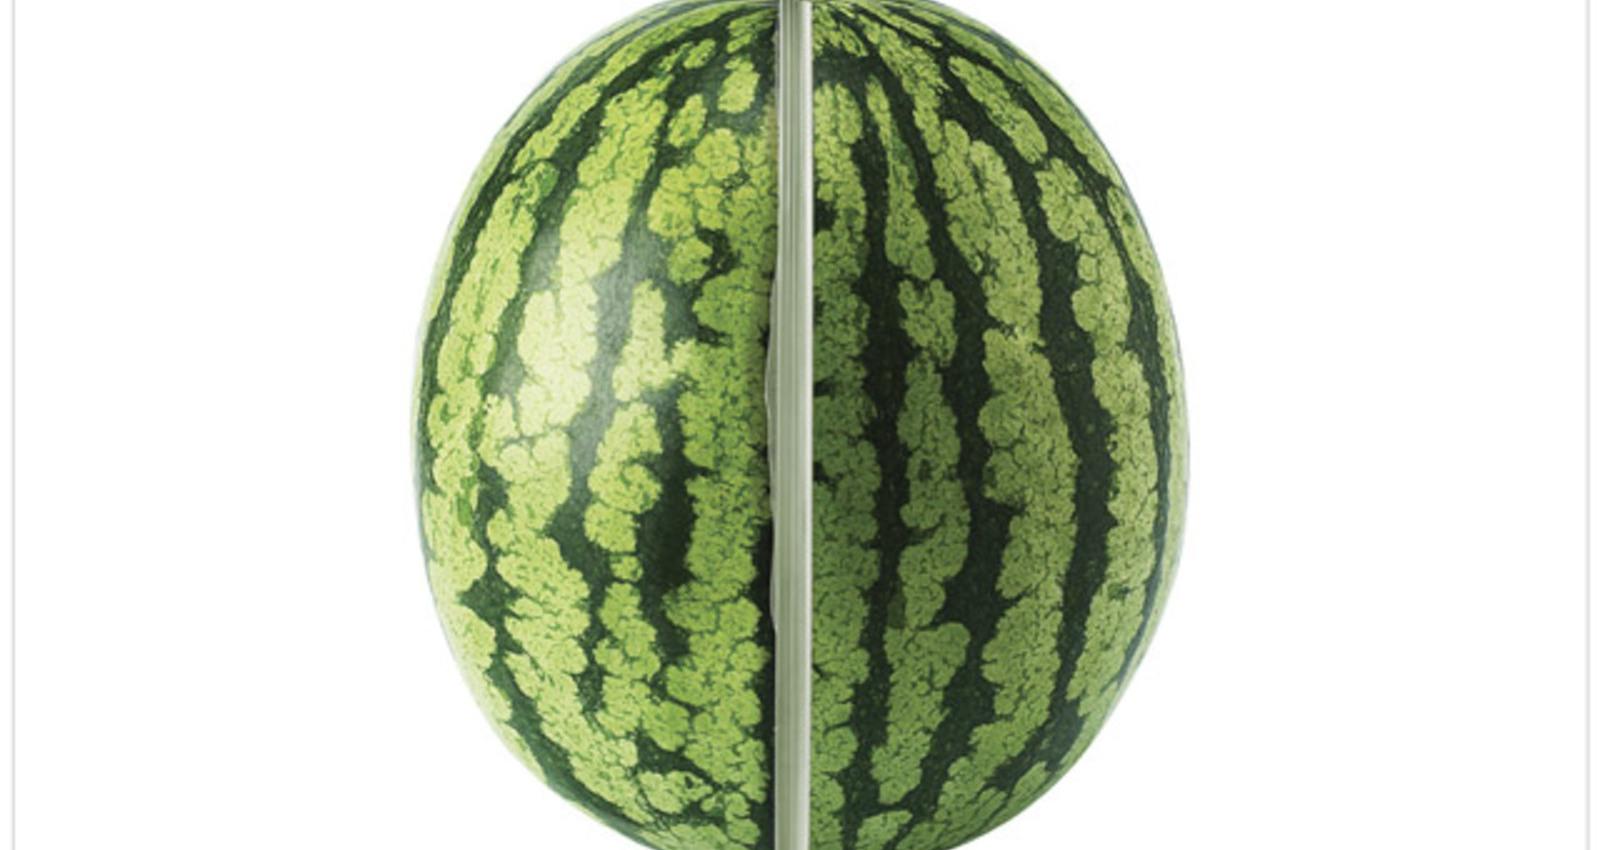 Orange/ Melon/ Onion/ Soybean/ Cockle